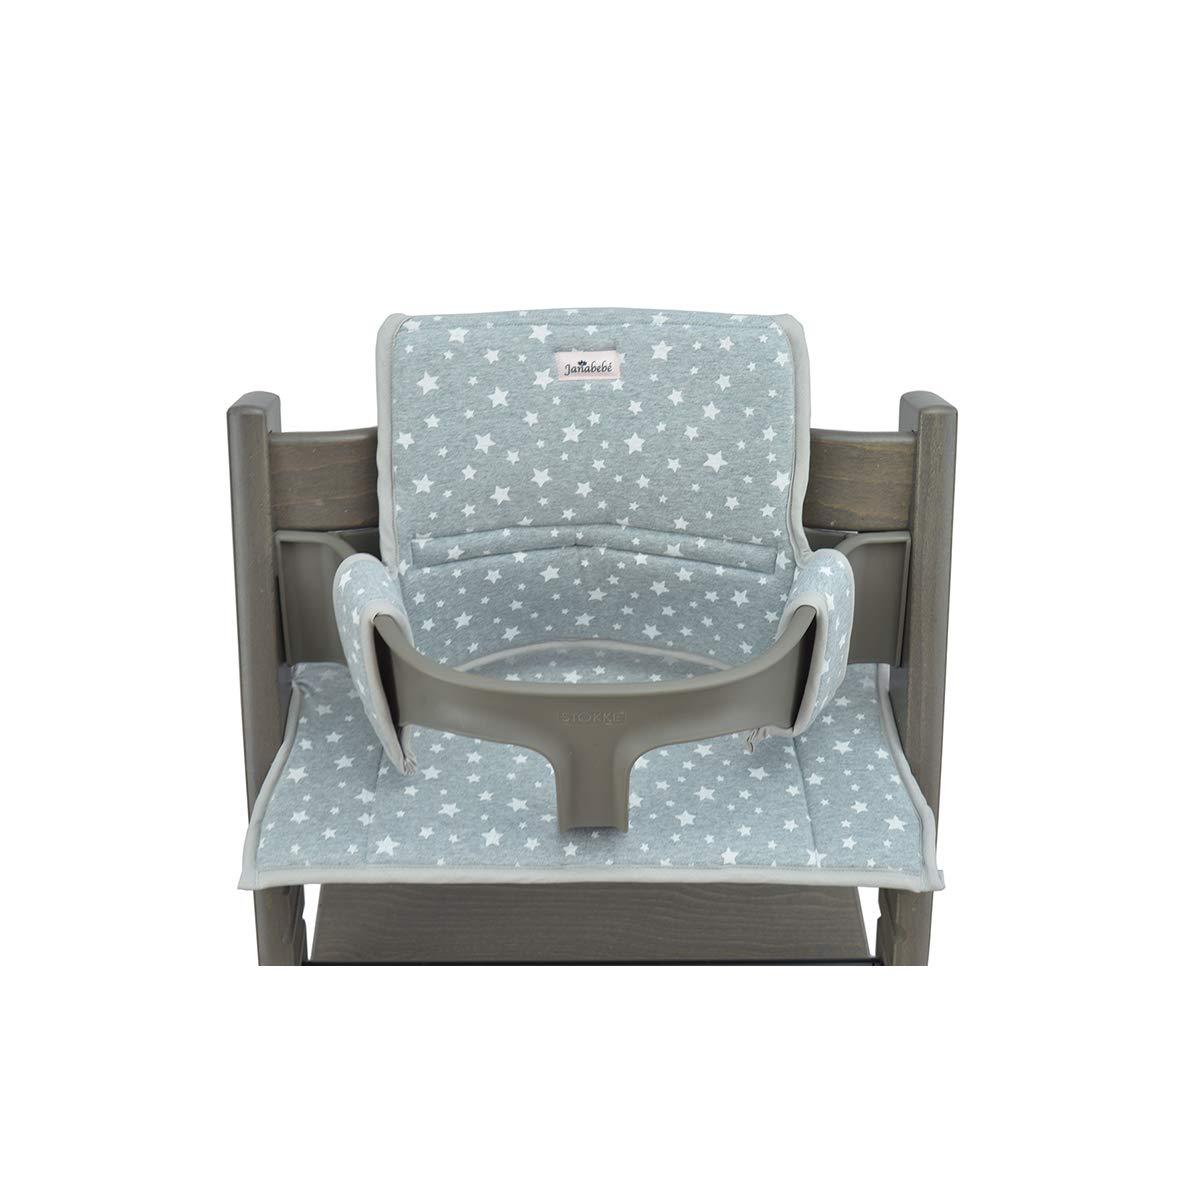 Janabebé Cushion for high Chair Stokke Tripp Trapp (White Star)